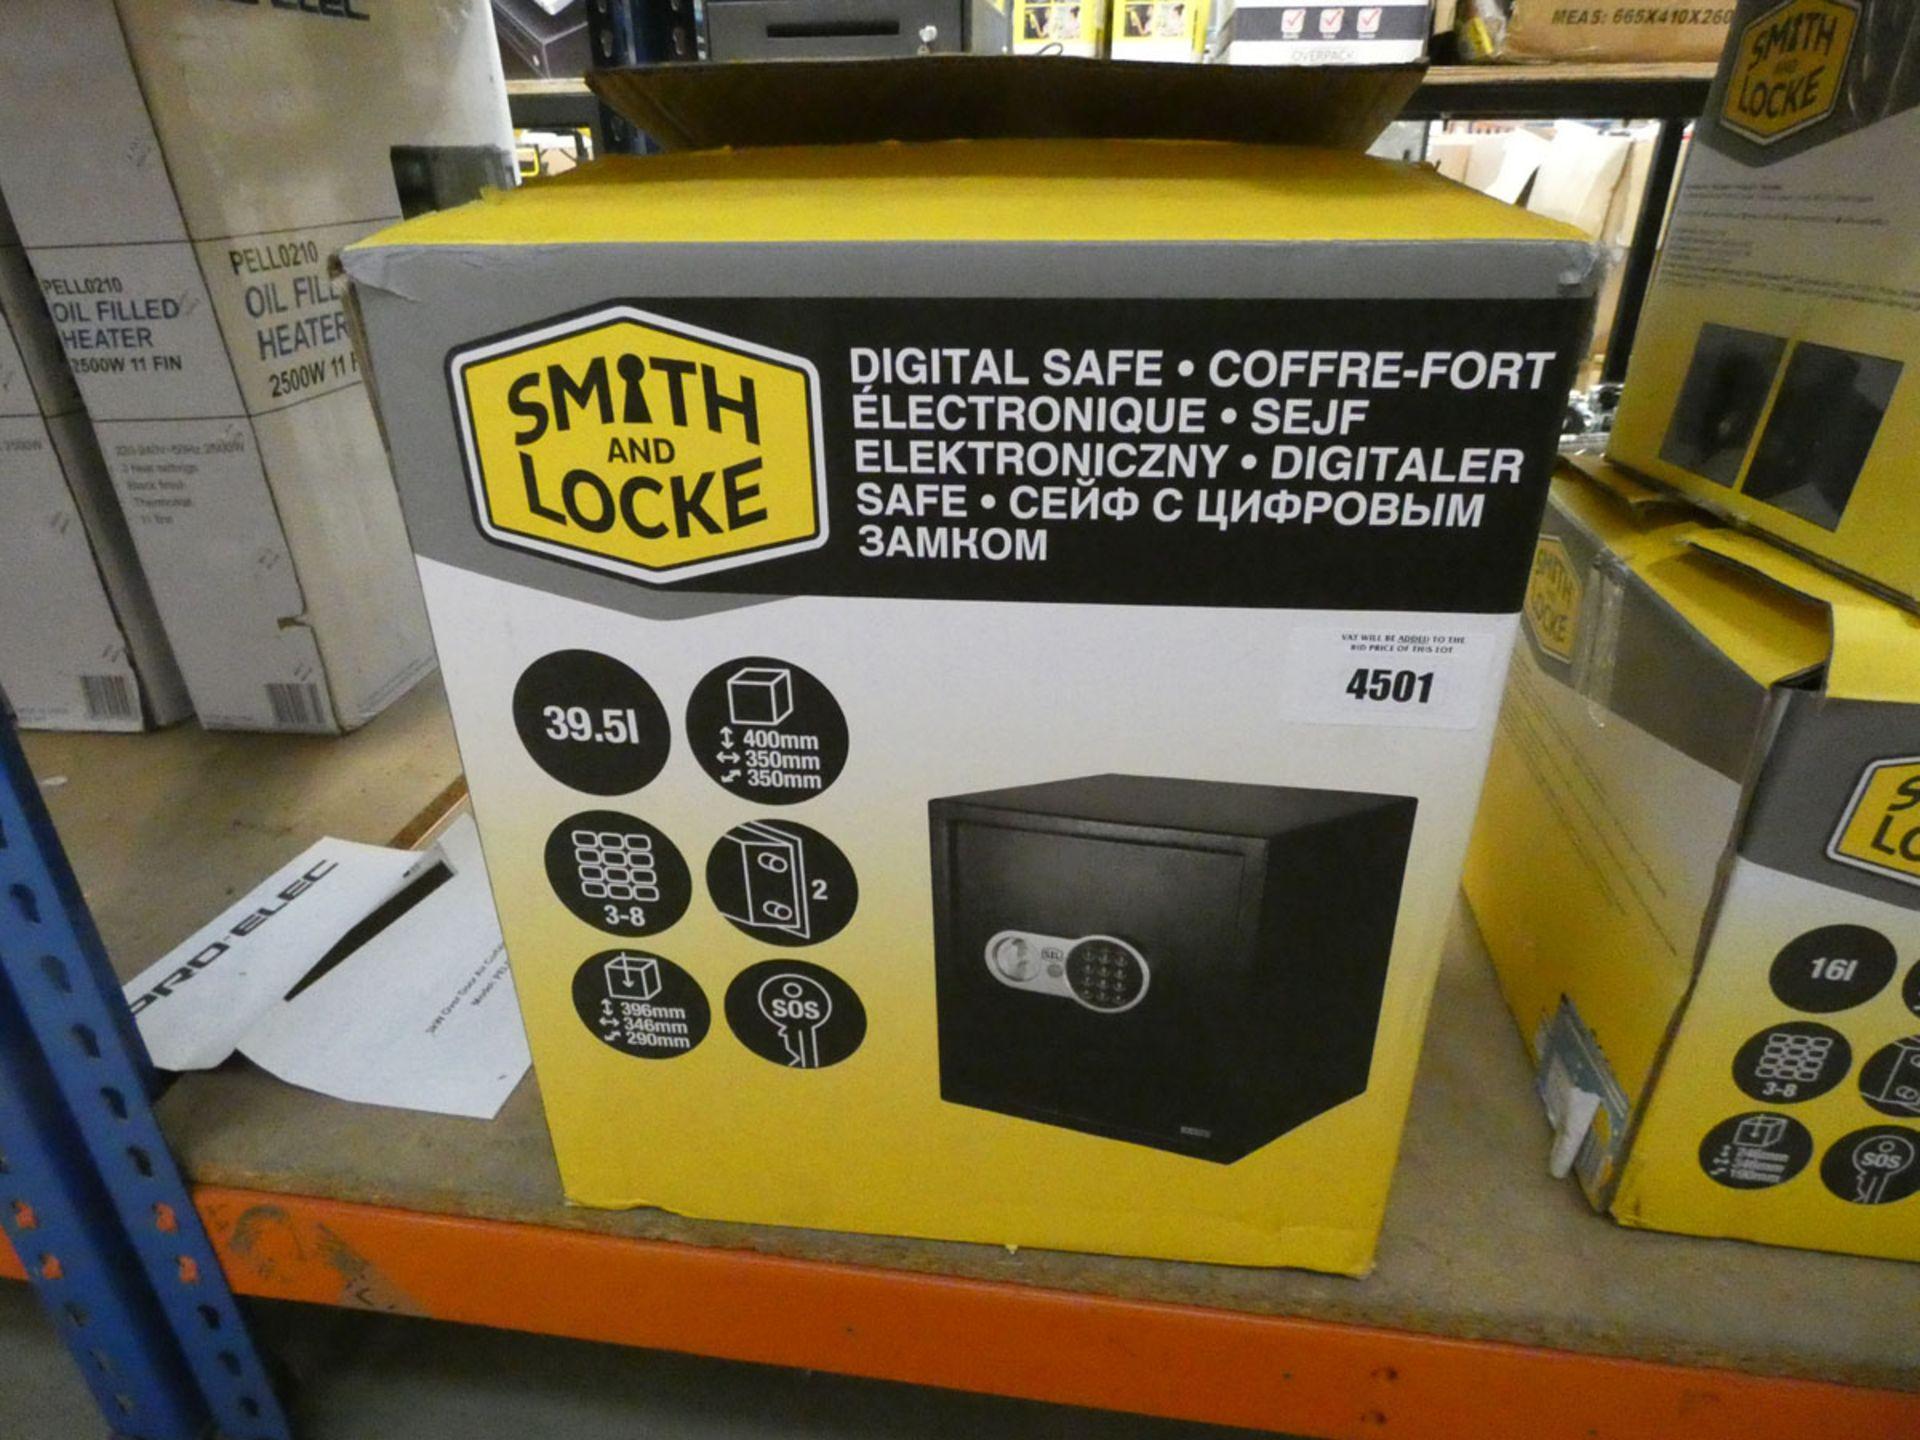 Large Smith & Locke digital safe